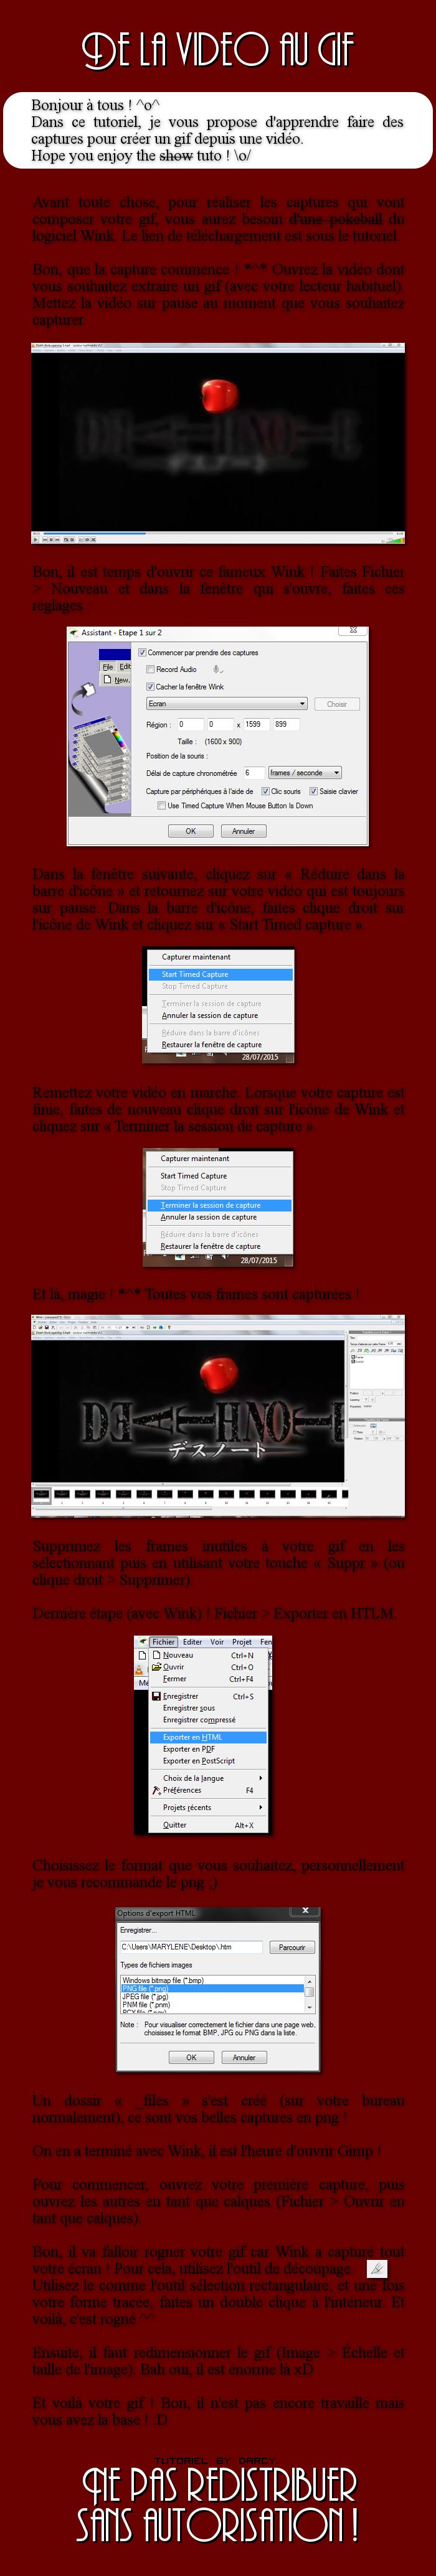 [Gimp]De la vidéo au GIF 296054Delavidoaugif